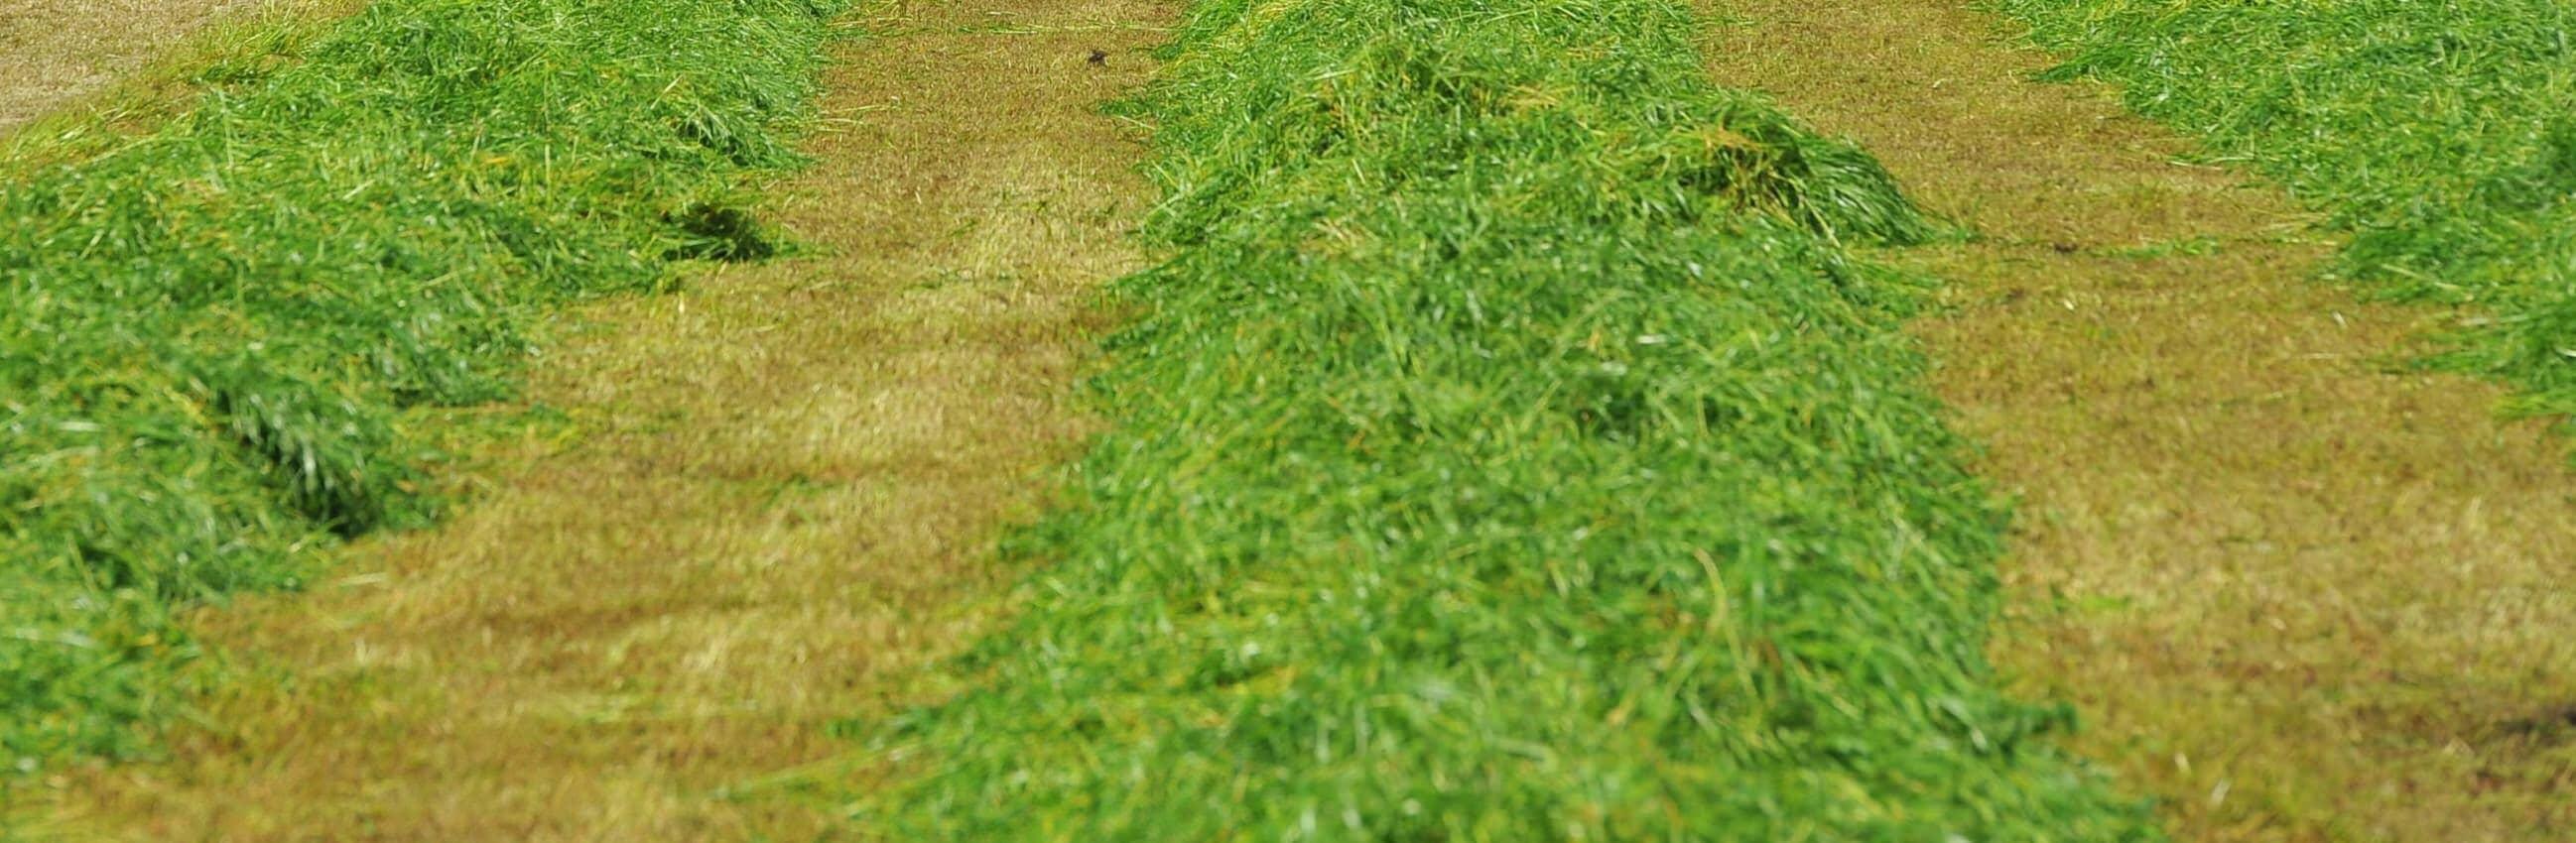 Good aftercut fertiliser management essential in 2020